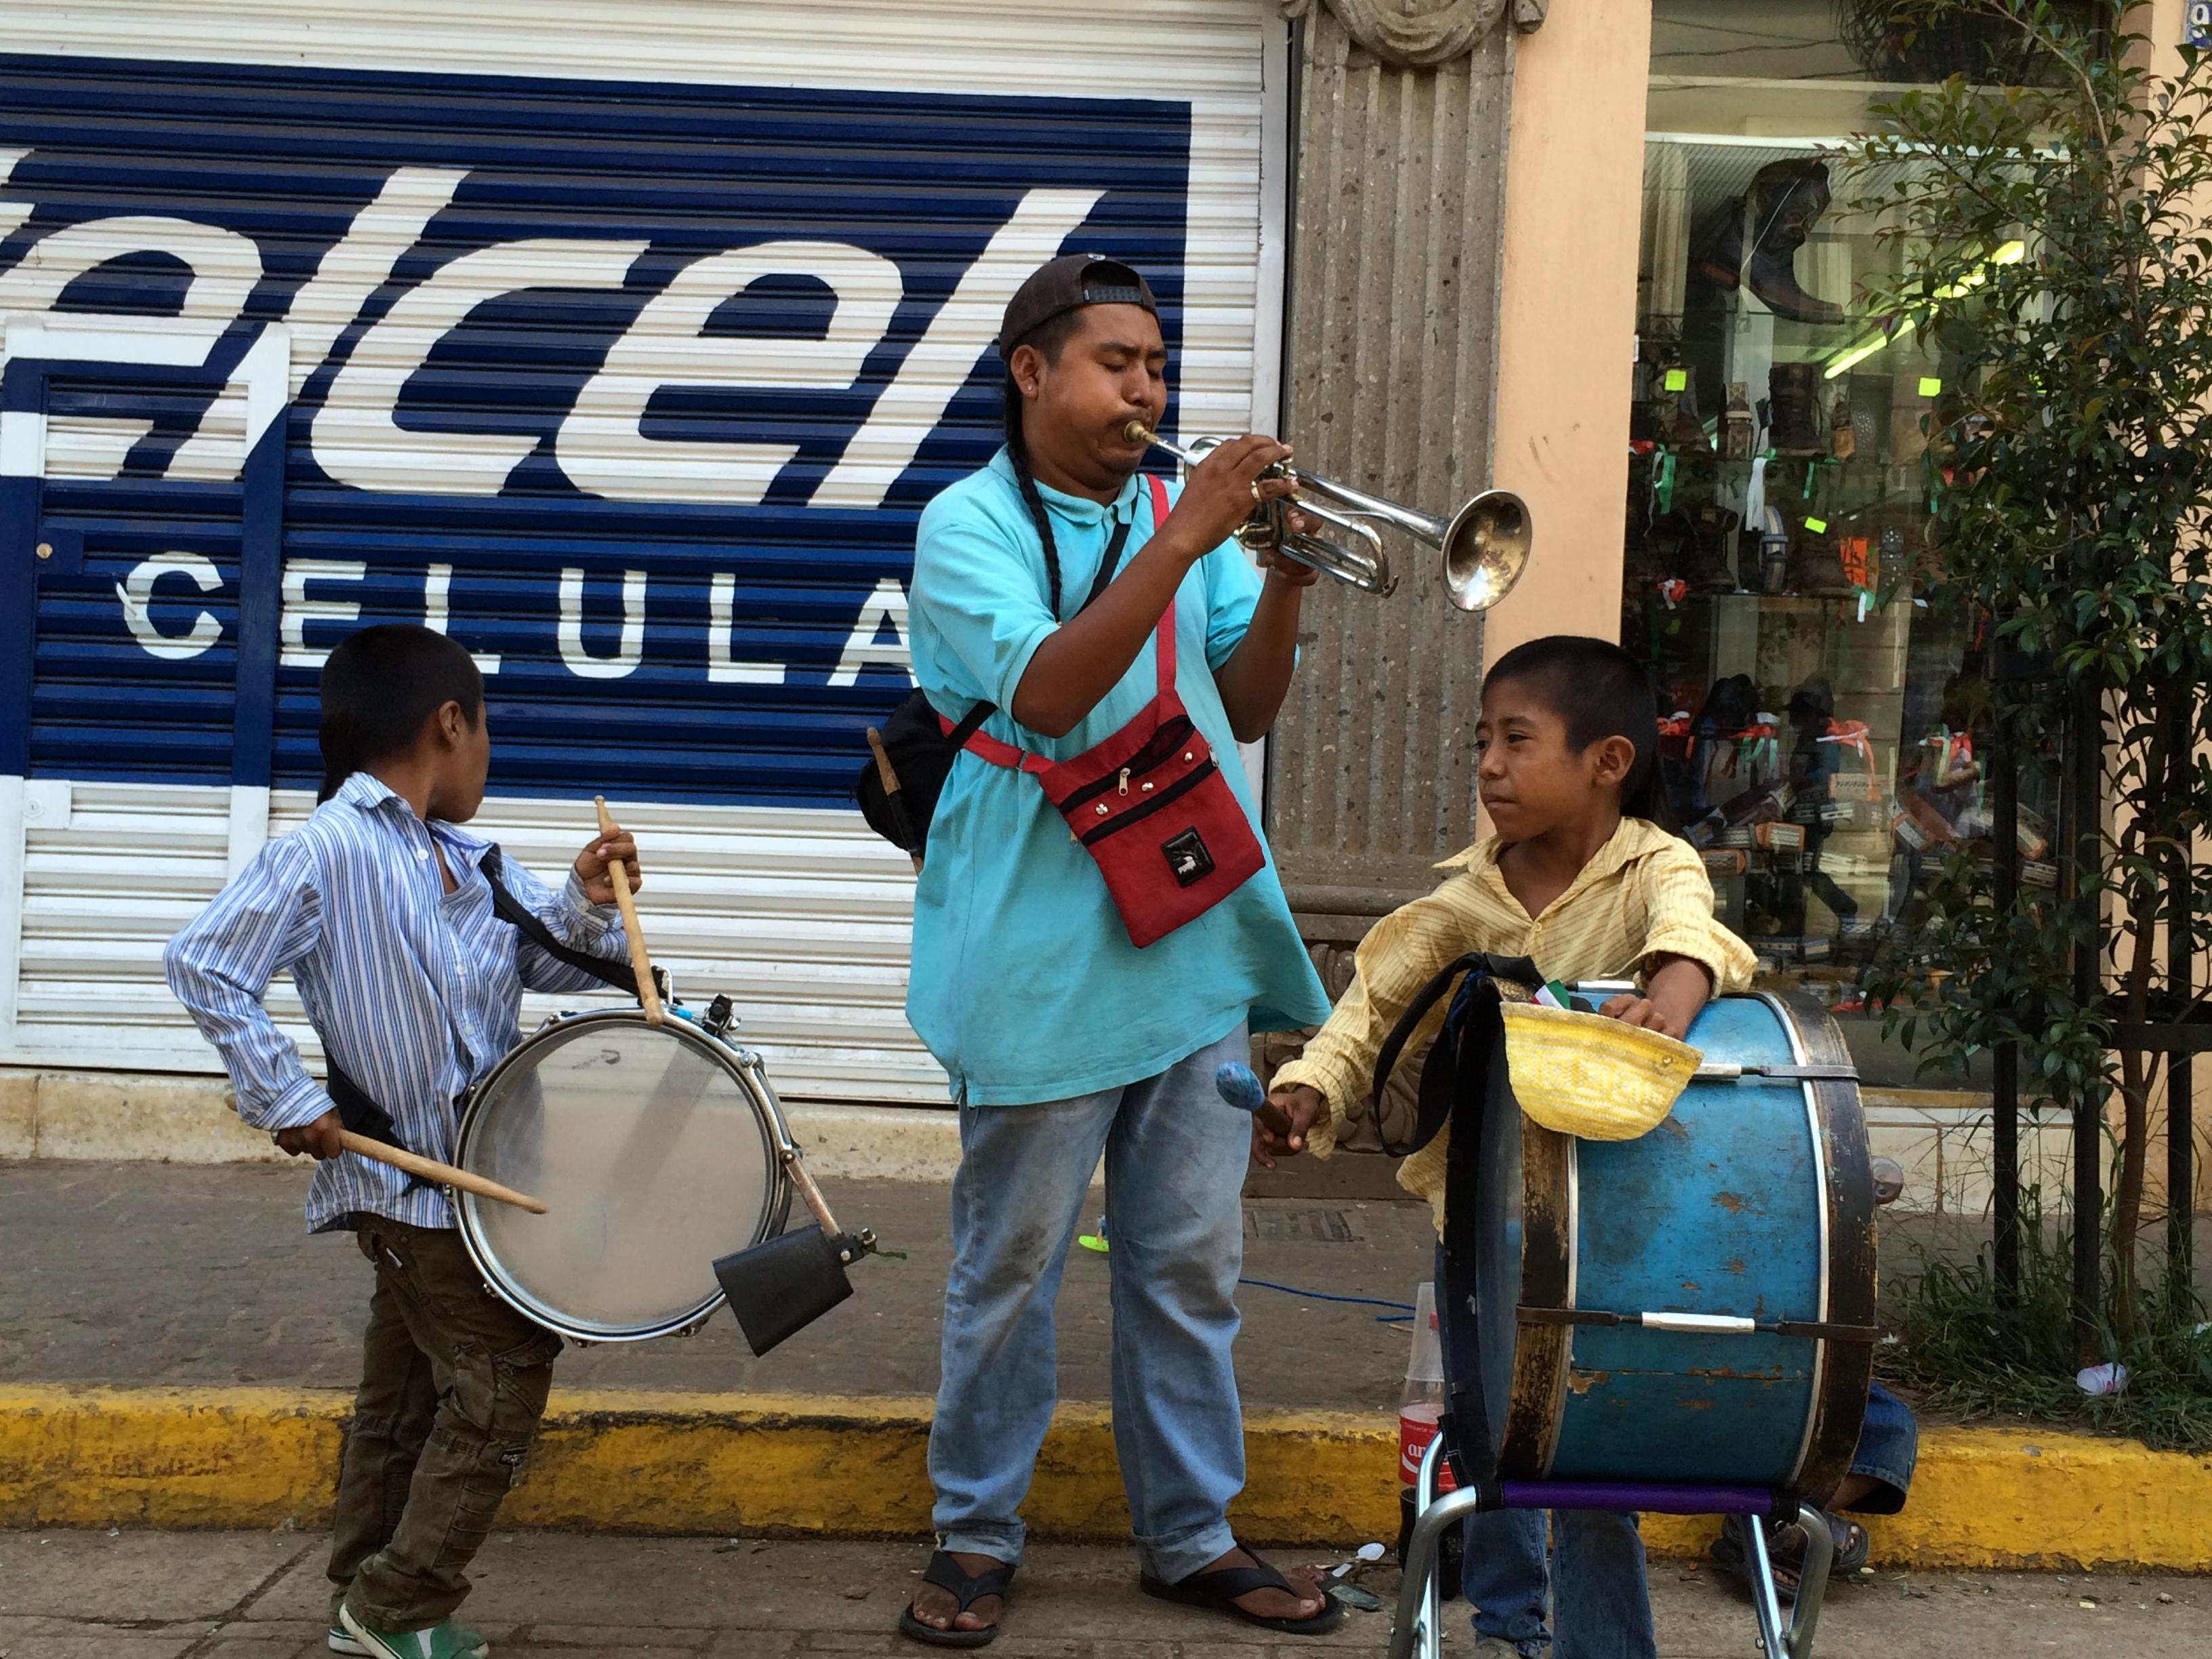 Acústica regional callejera